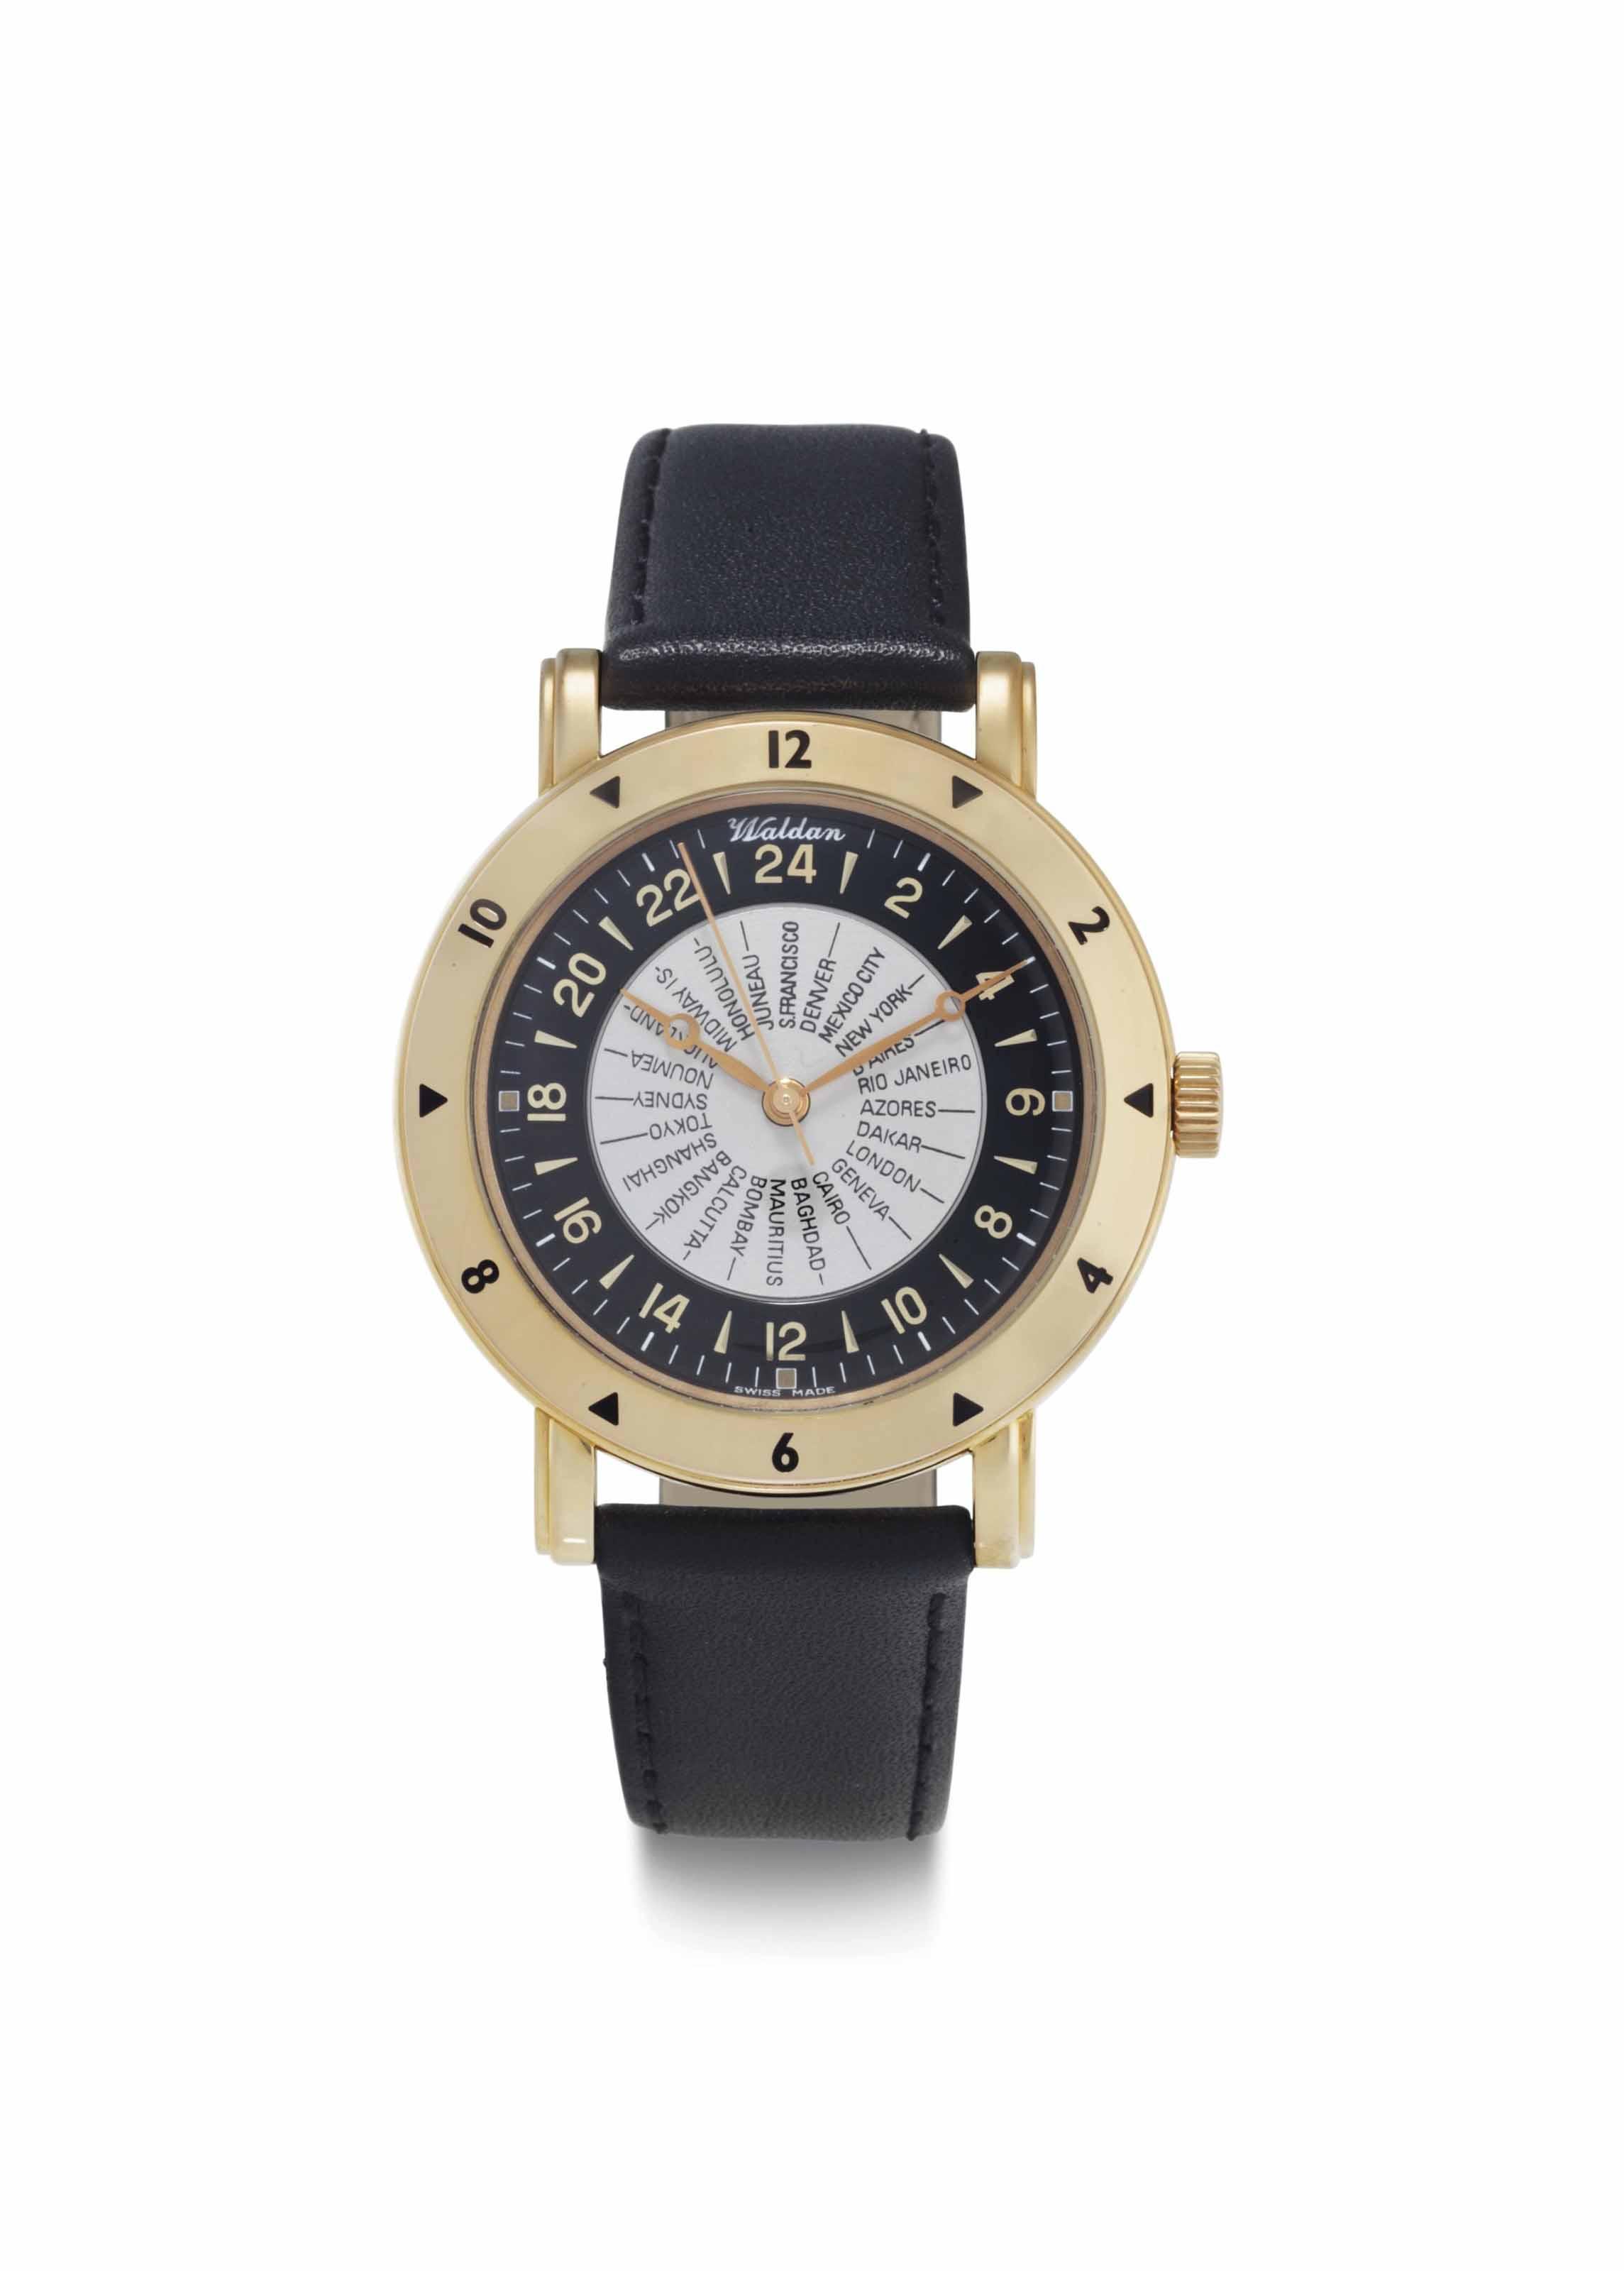 Waldan International. An 18k Pink Gold Automatic World Time Wristwatch